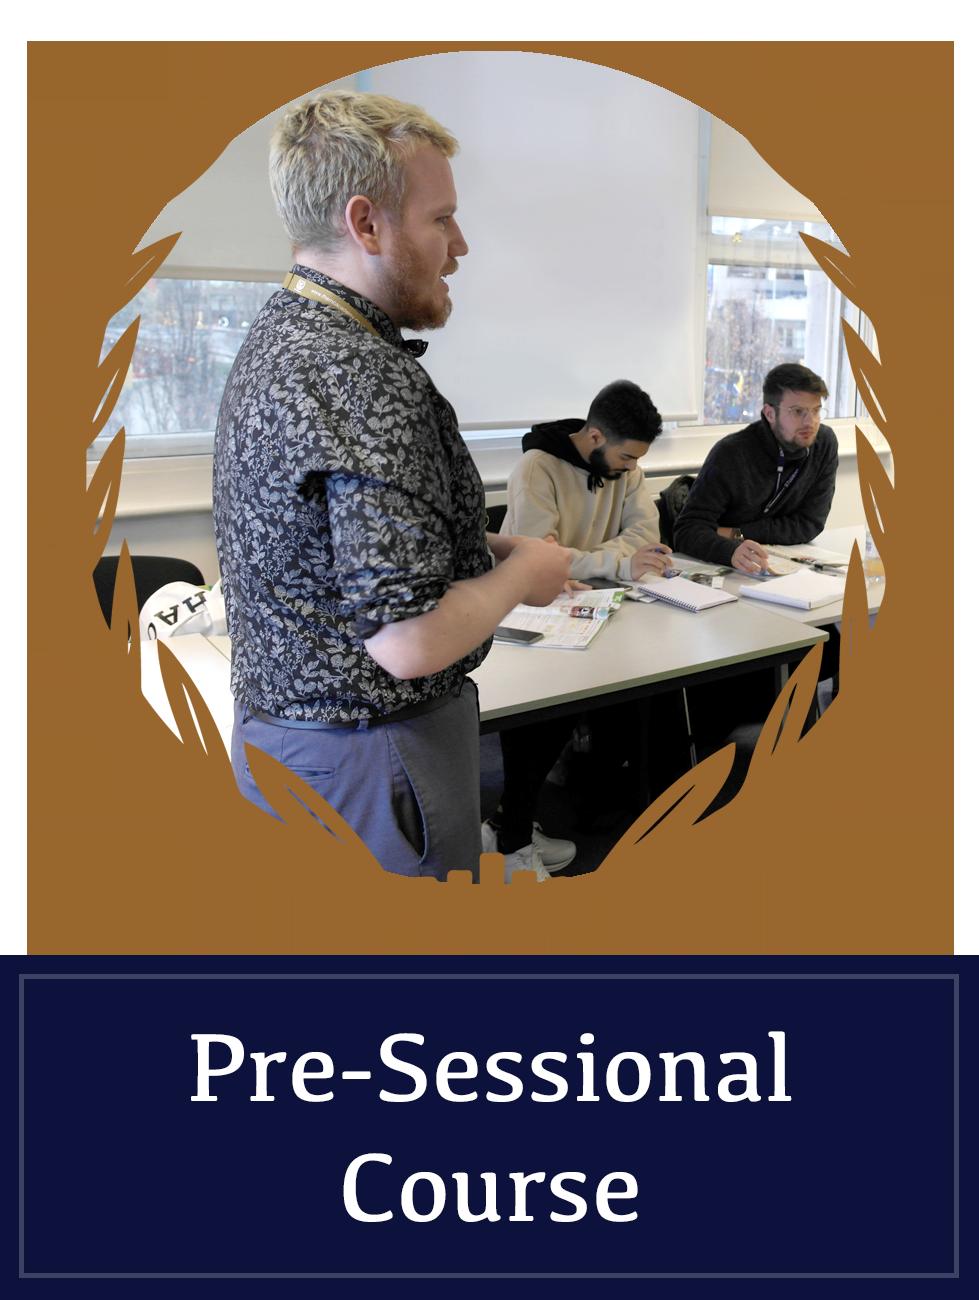 Pre-Sessional Course